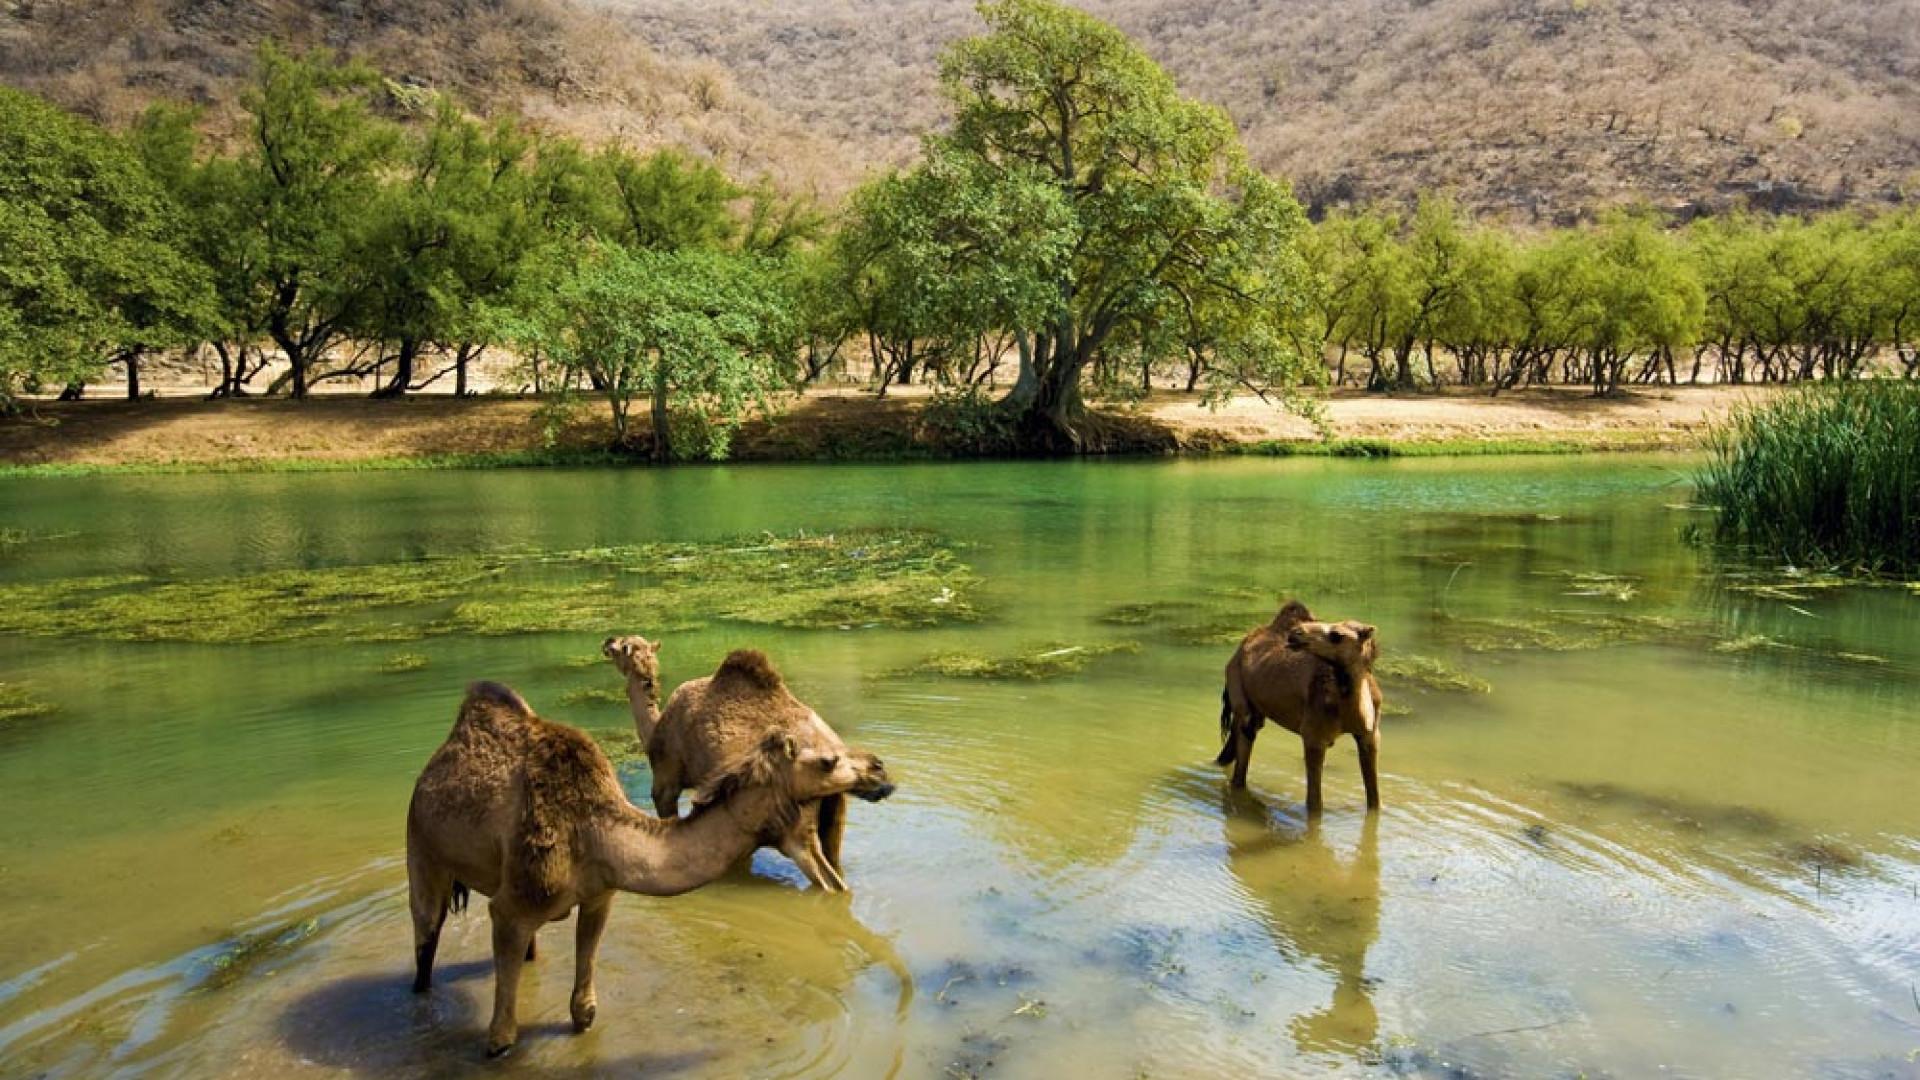 Camels in Wadi Darbat, southern Oman